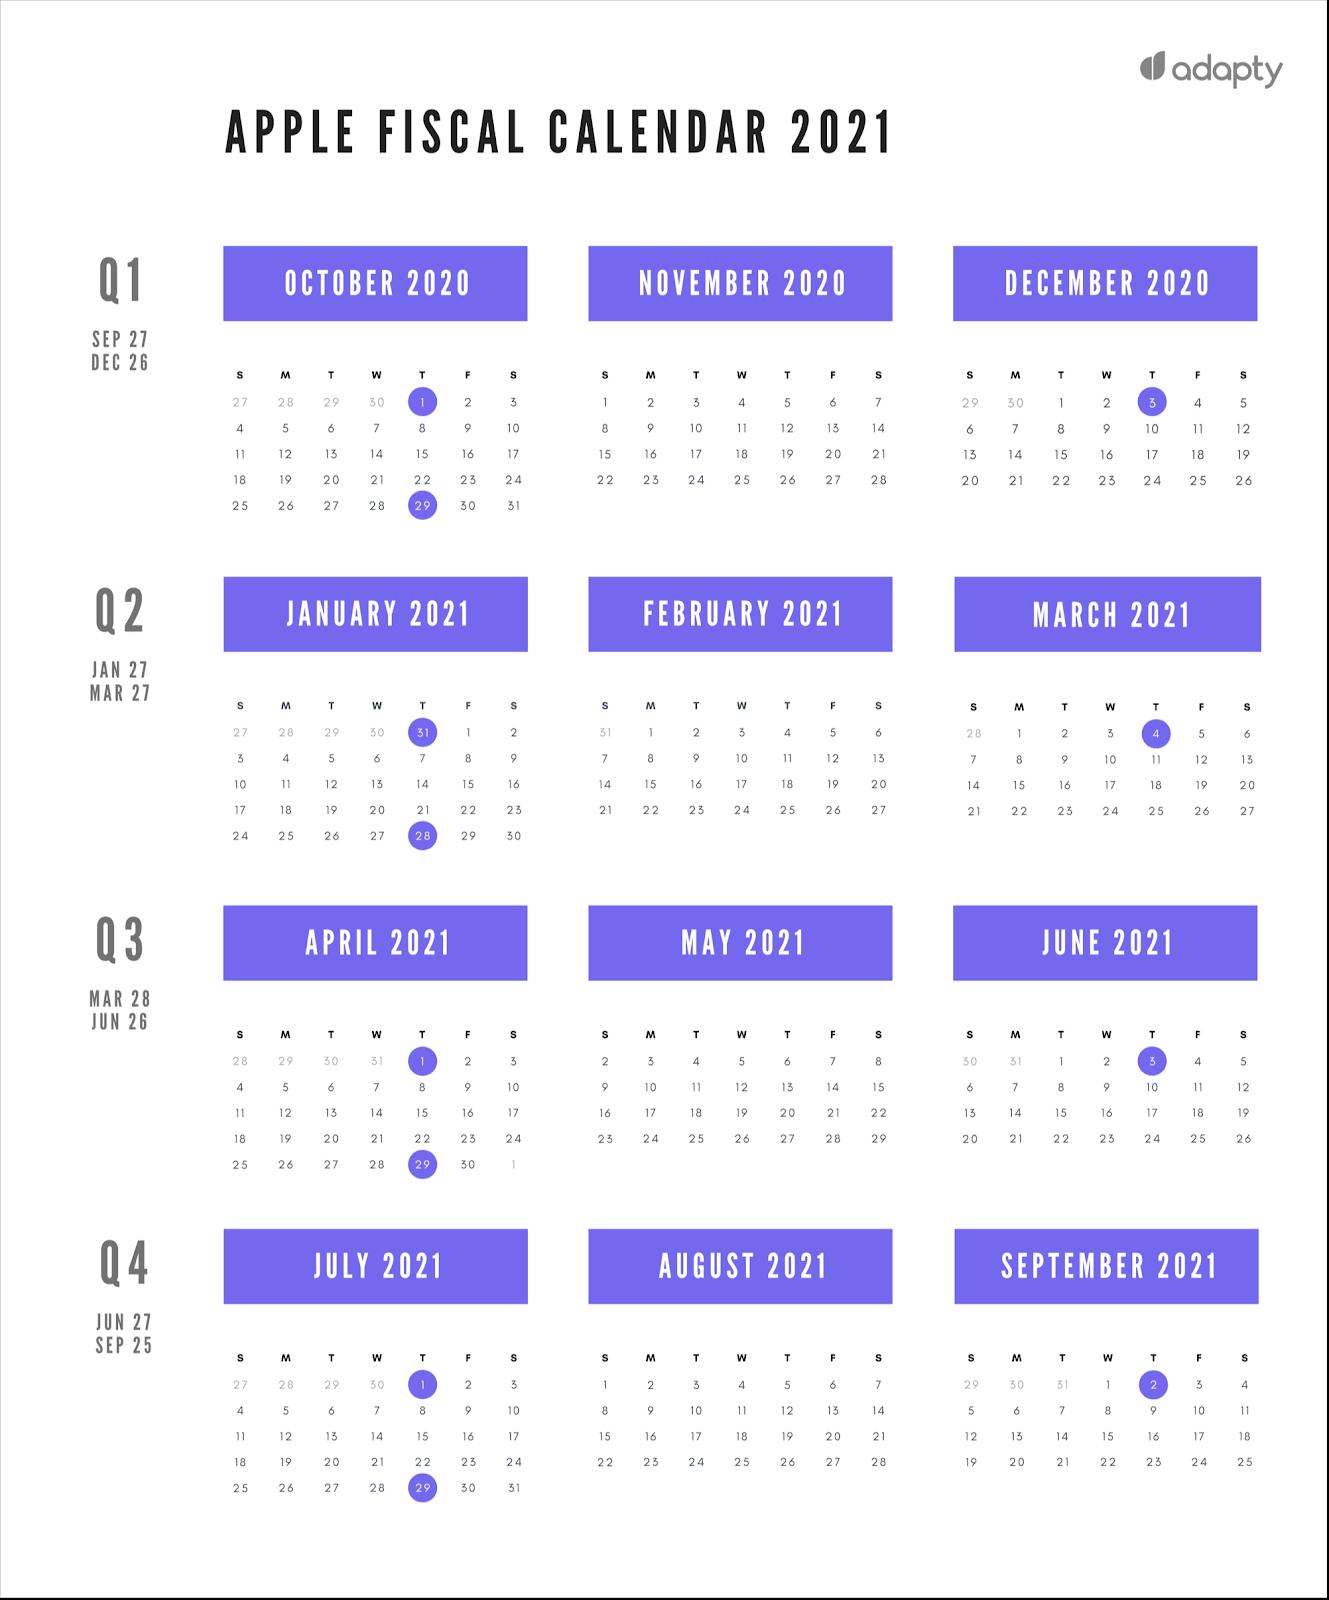 Apple fiscal calendar 2021